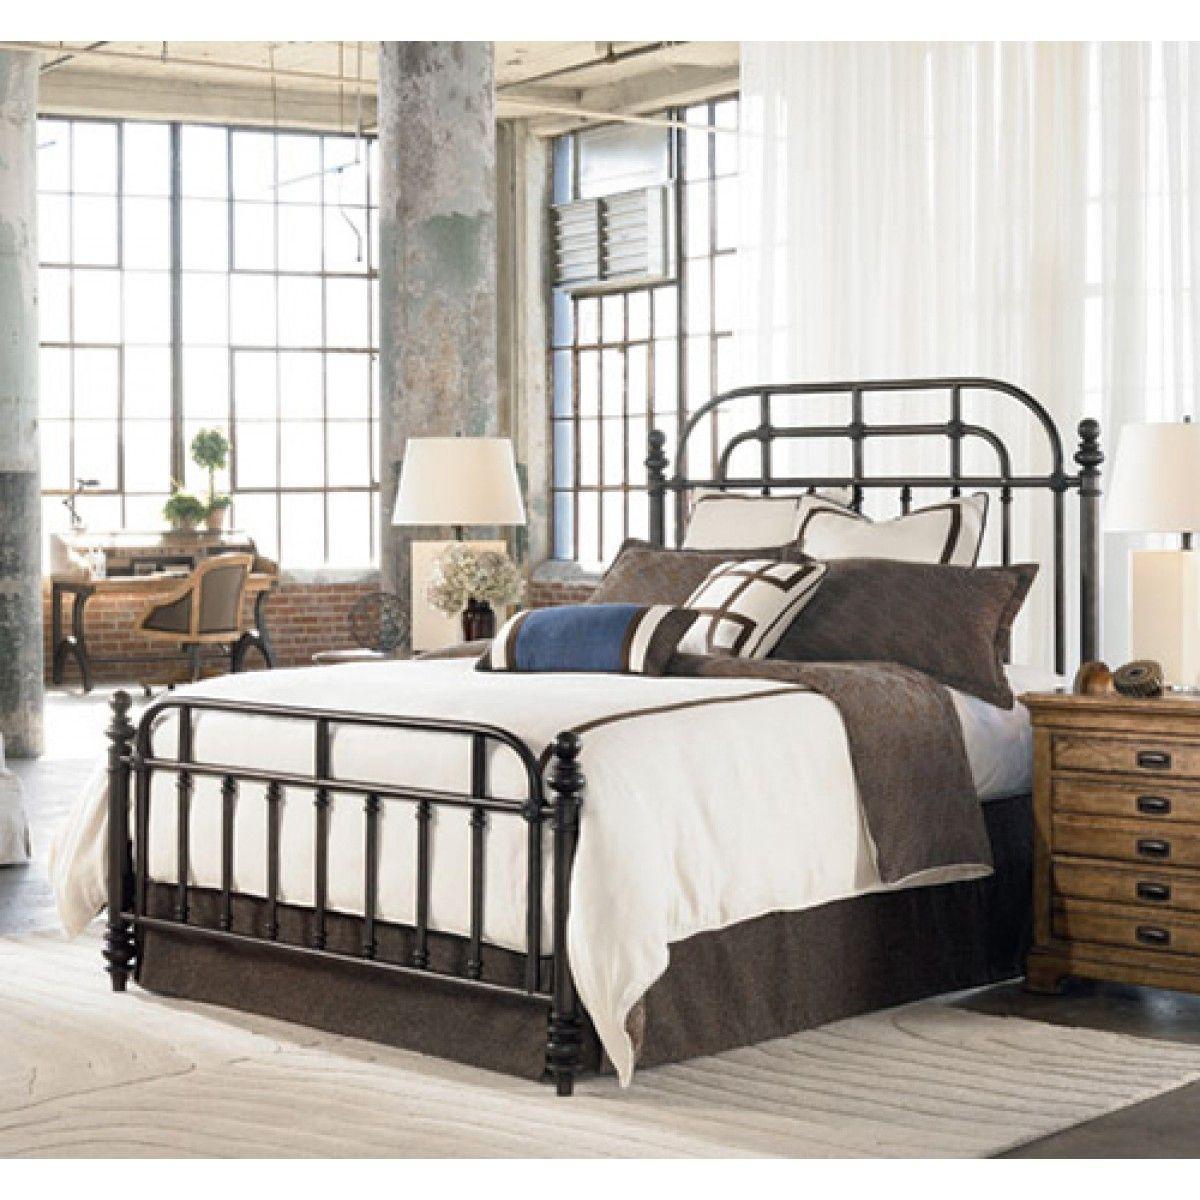 Thomasville Pullman metal bed 5/0 Model home furnishings